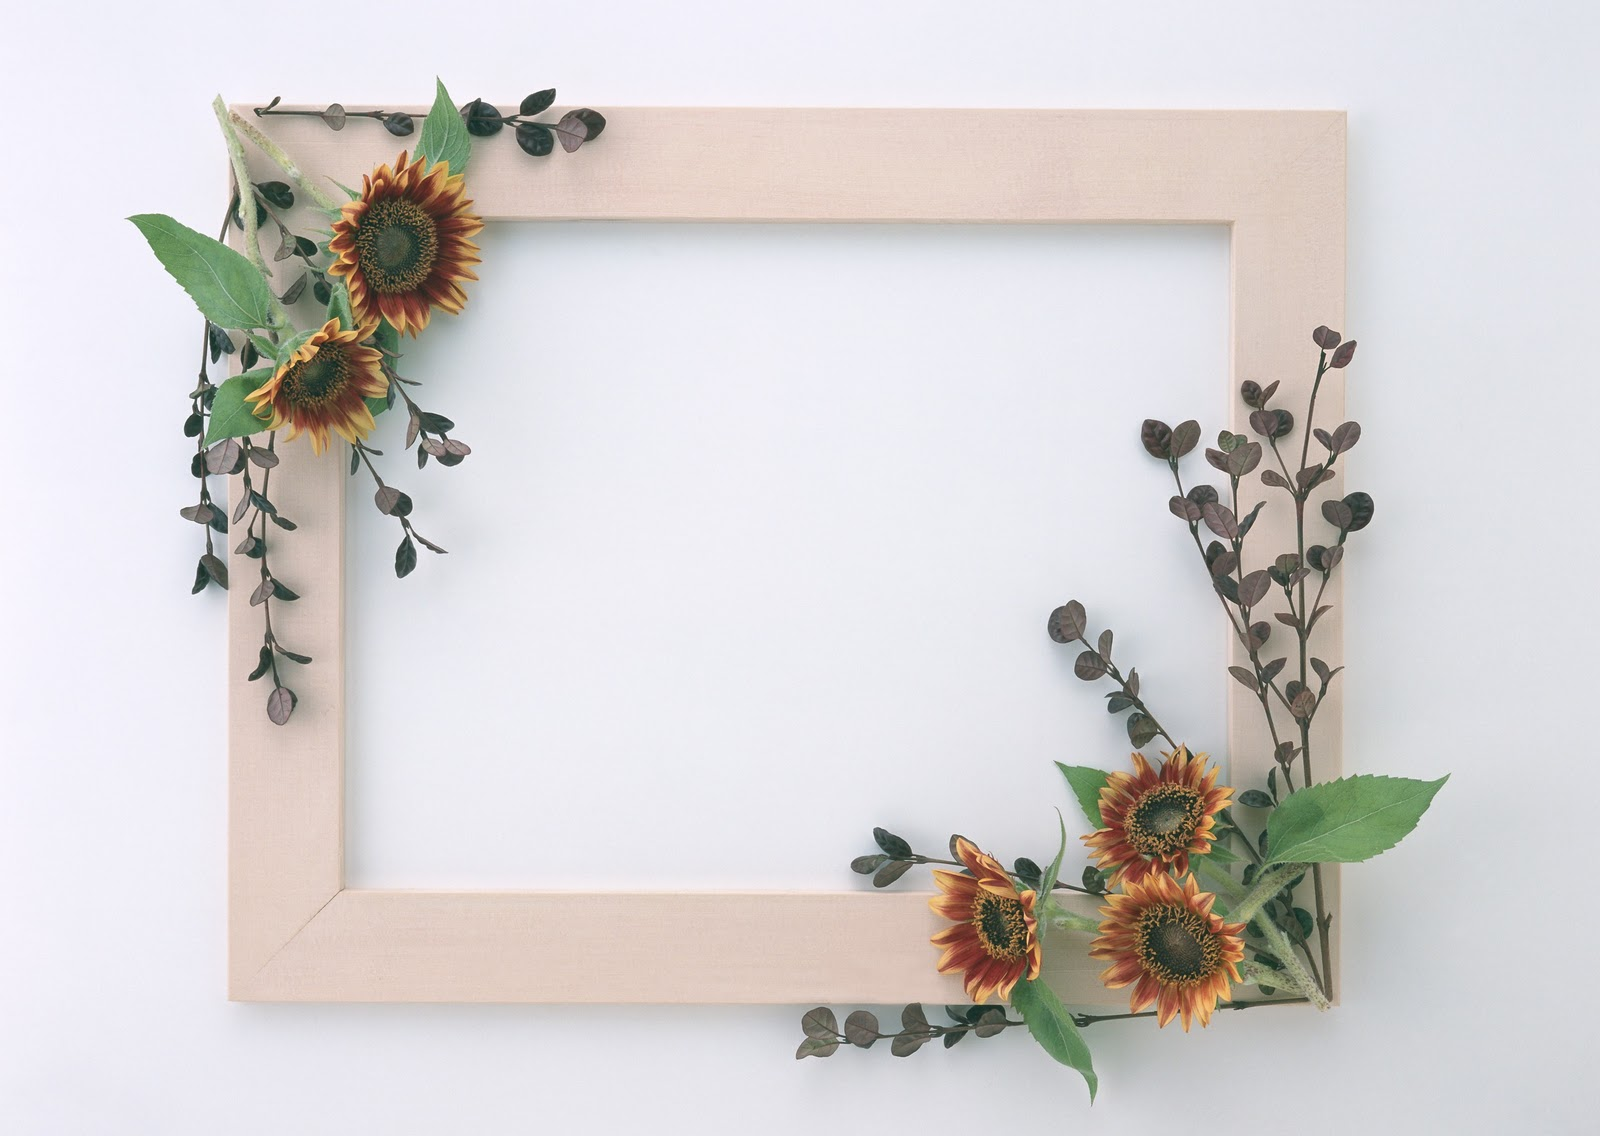 Beautiful Stylish Flowers Photo Frames DOWNLOAD WALLPAPERS HD FREE 1600x1136